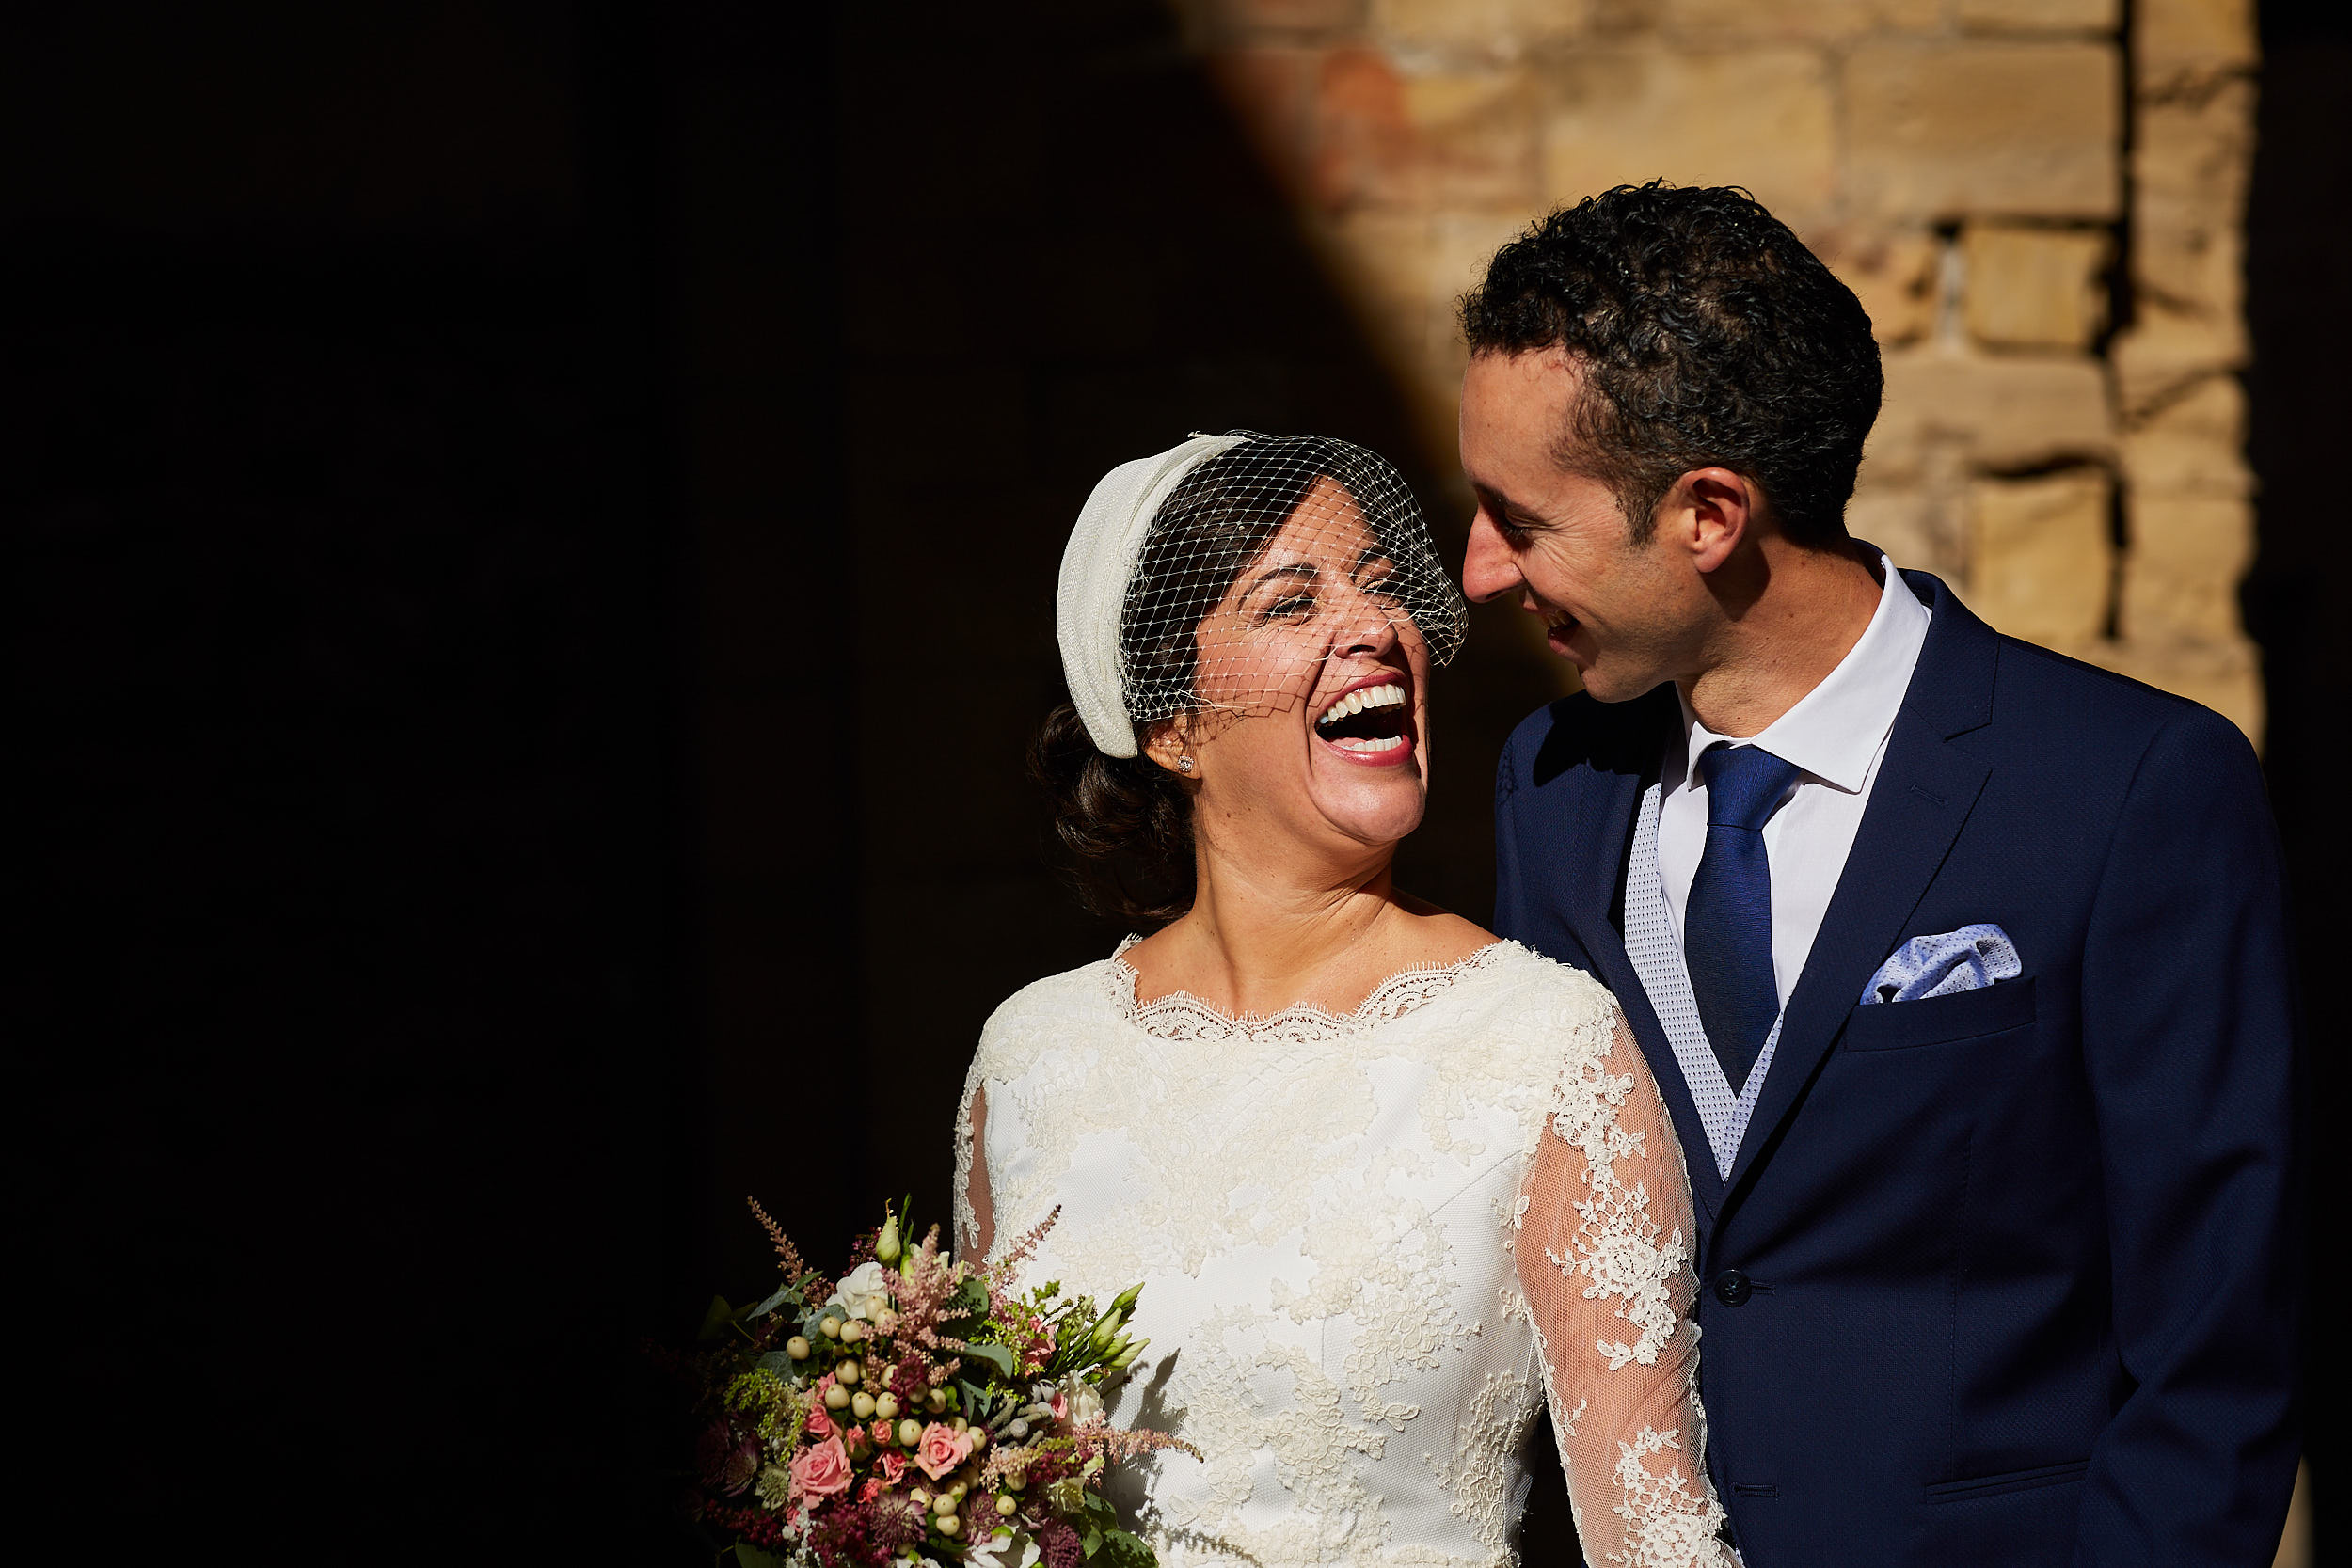 1811Basque_Country_Rioja_Wedding_Photographer_James_Sturcke_0043.jpg